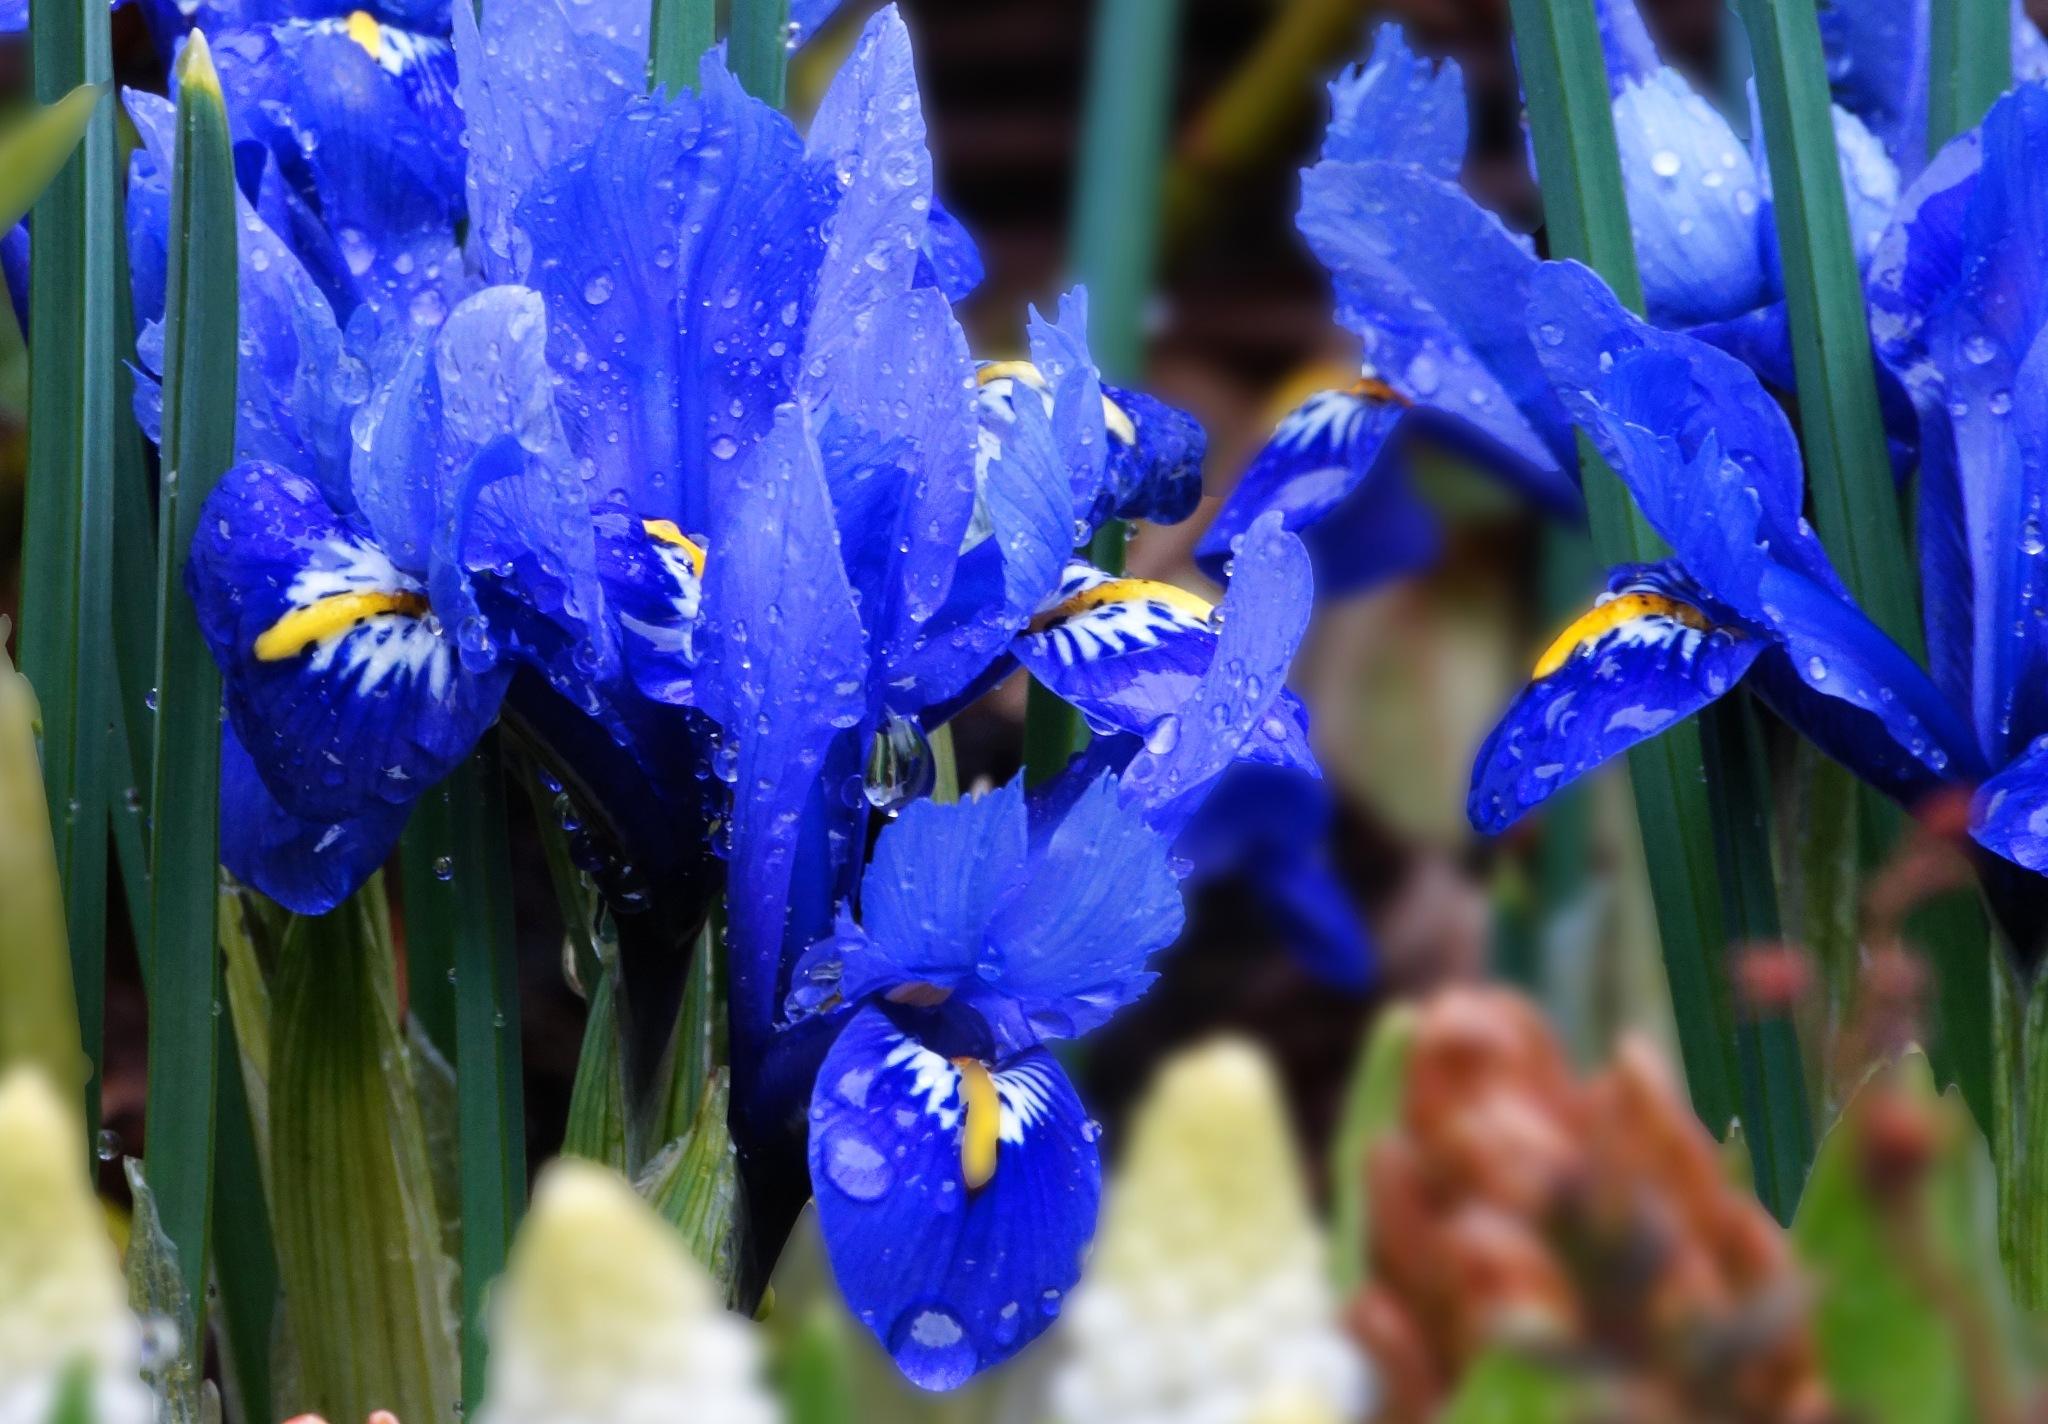 Iris in the Rain by Marian Baay